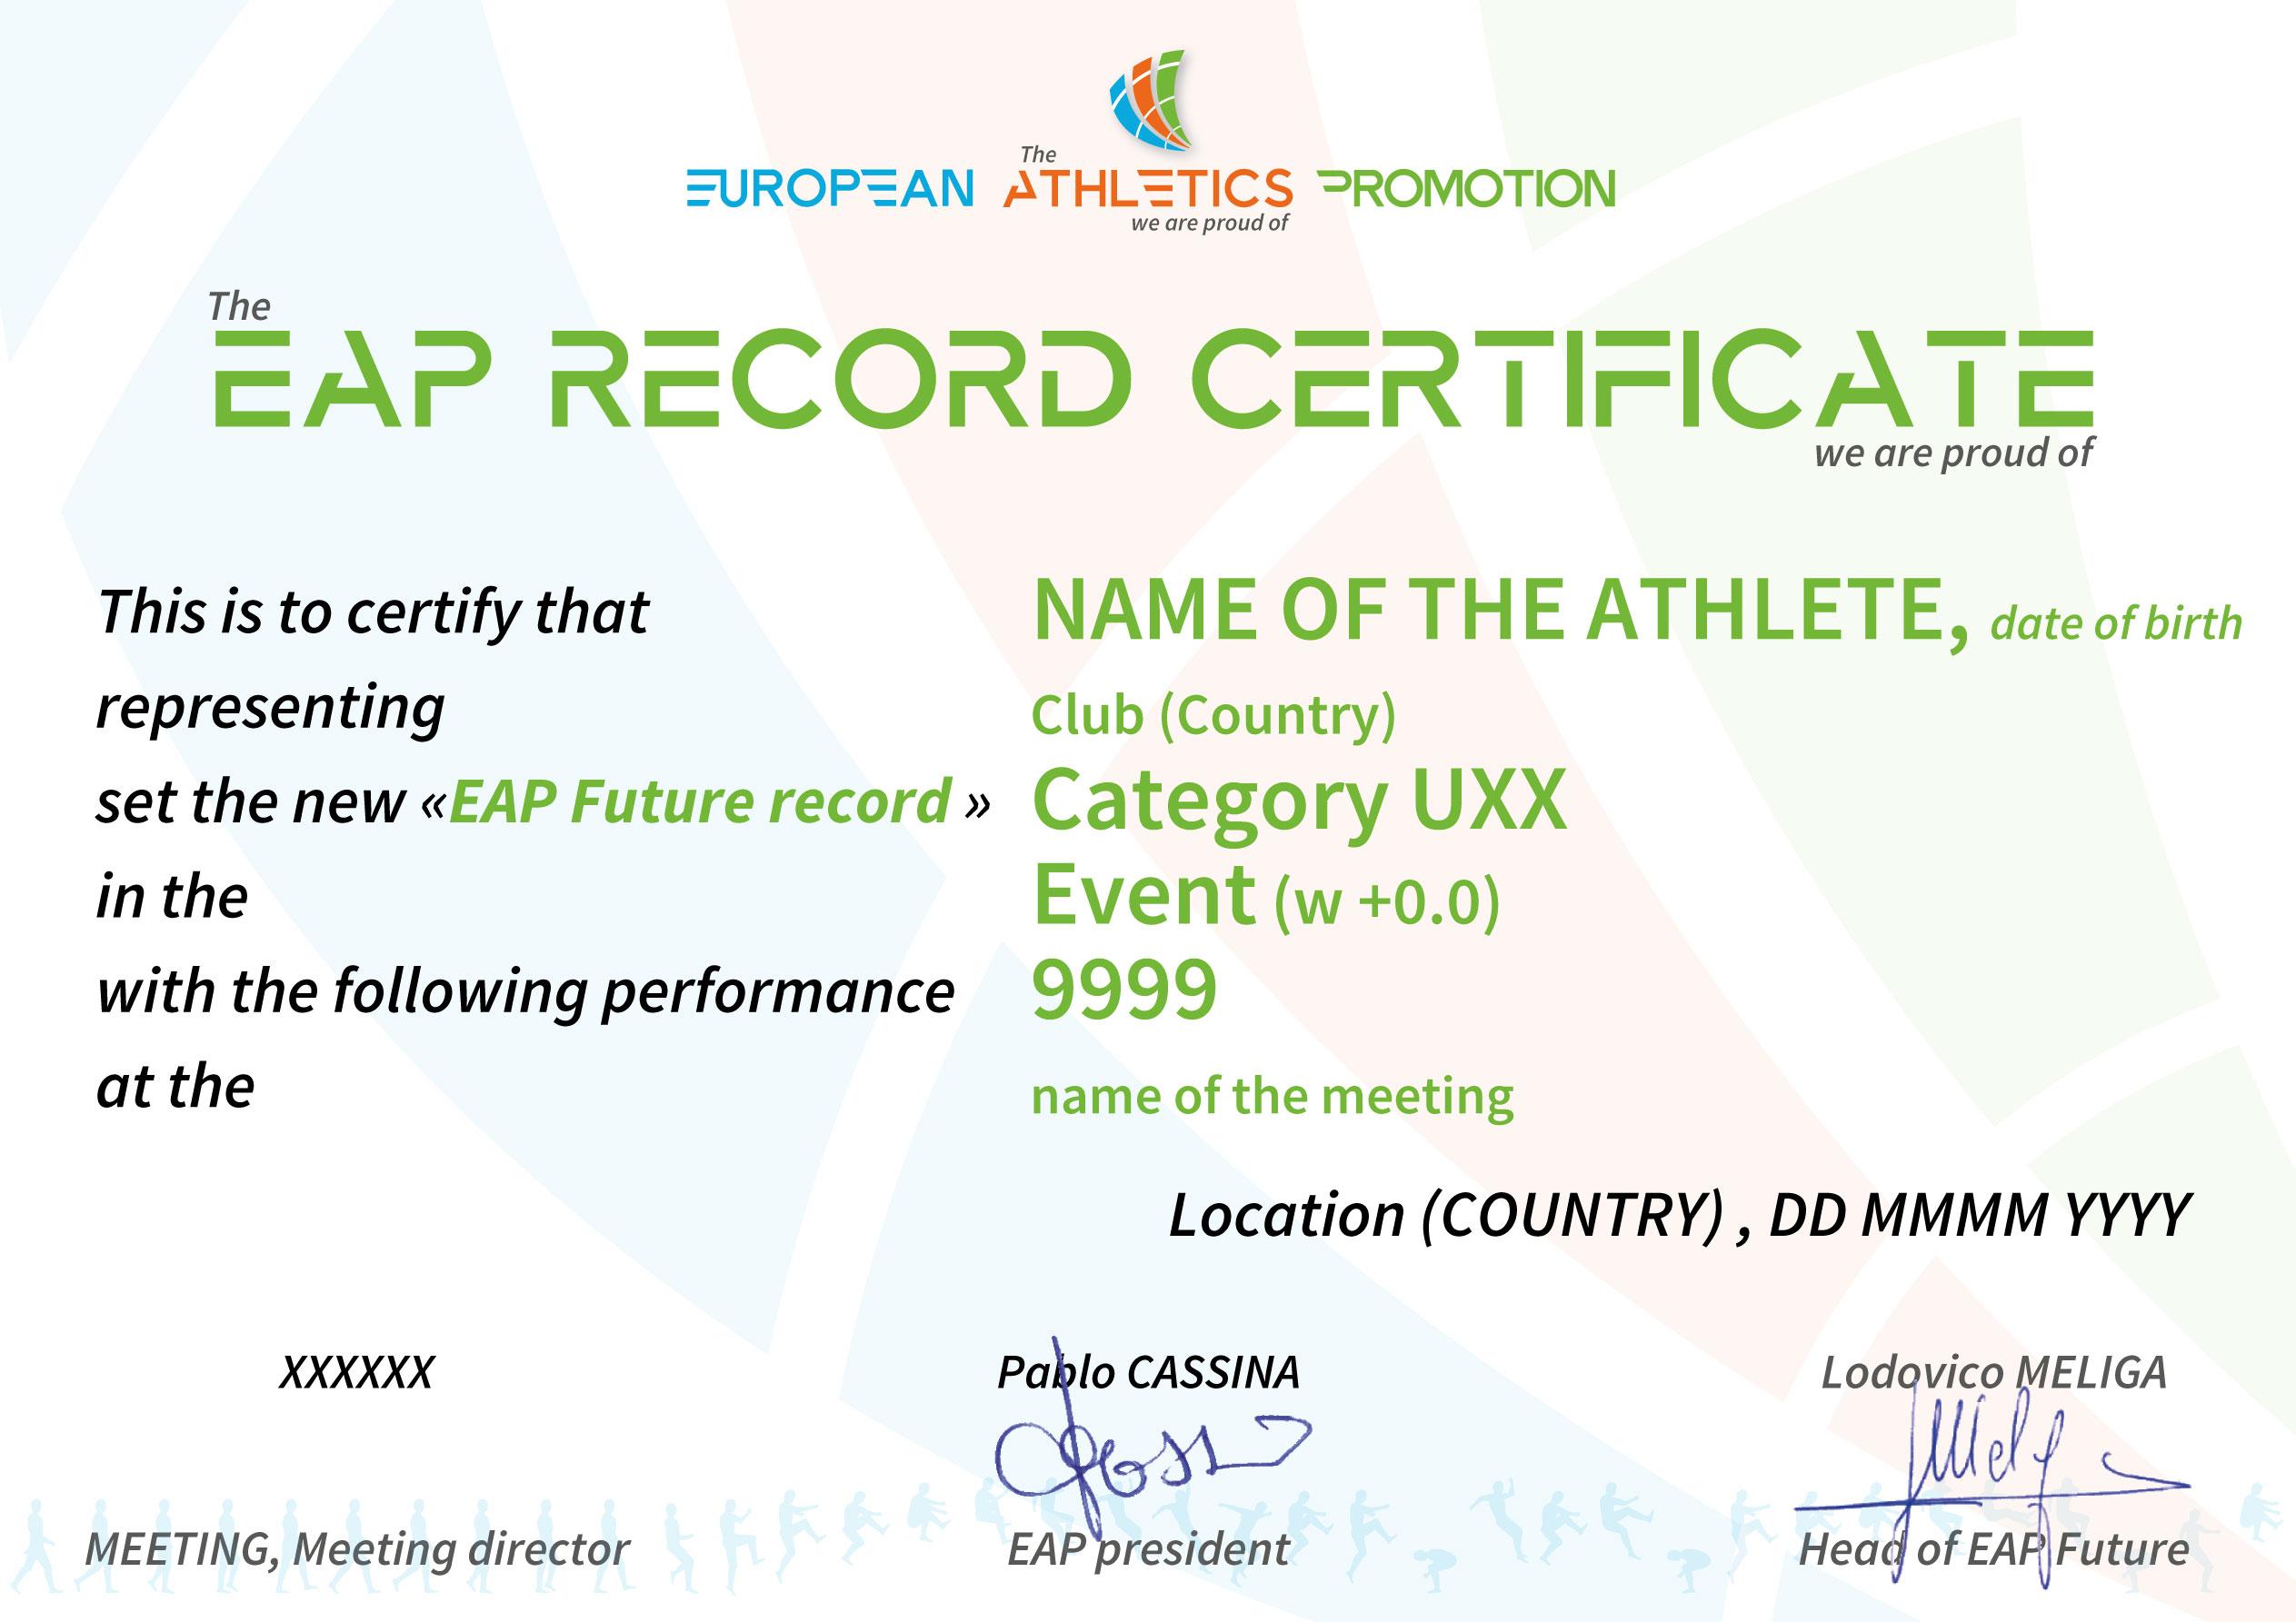 EAP Future record - JPG version